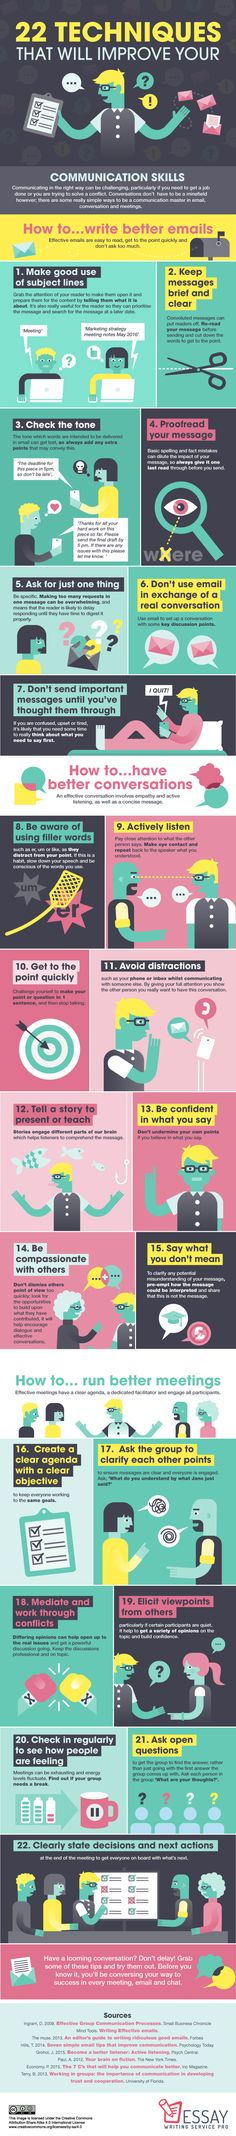 37 Best Effective Communication Skills Images